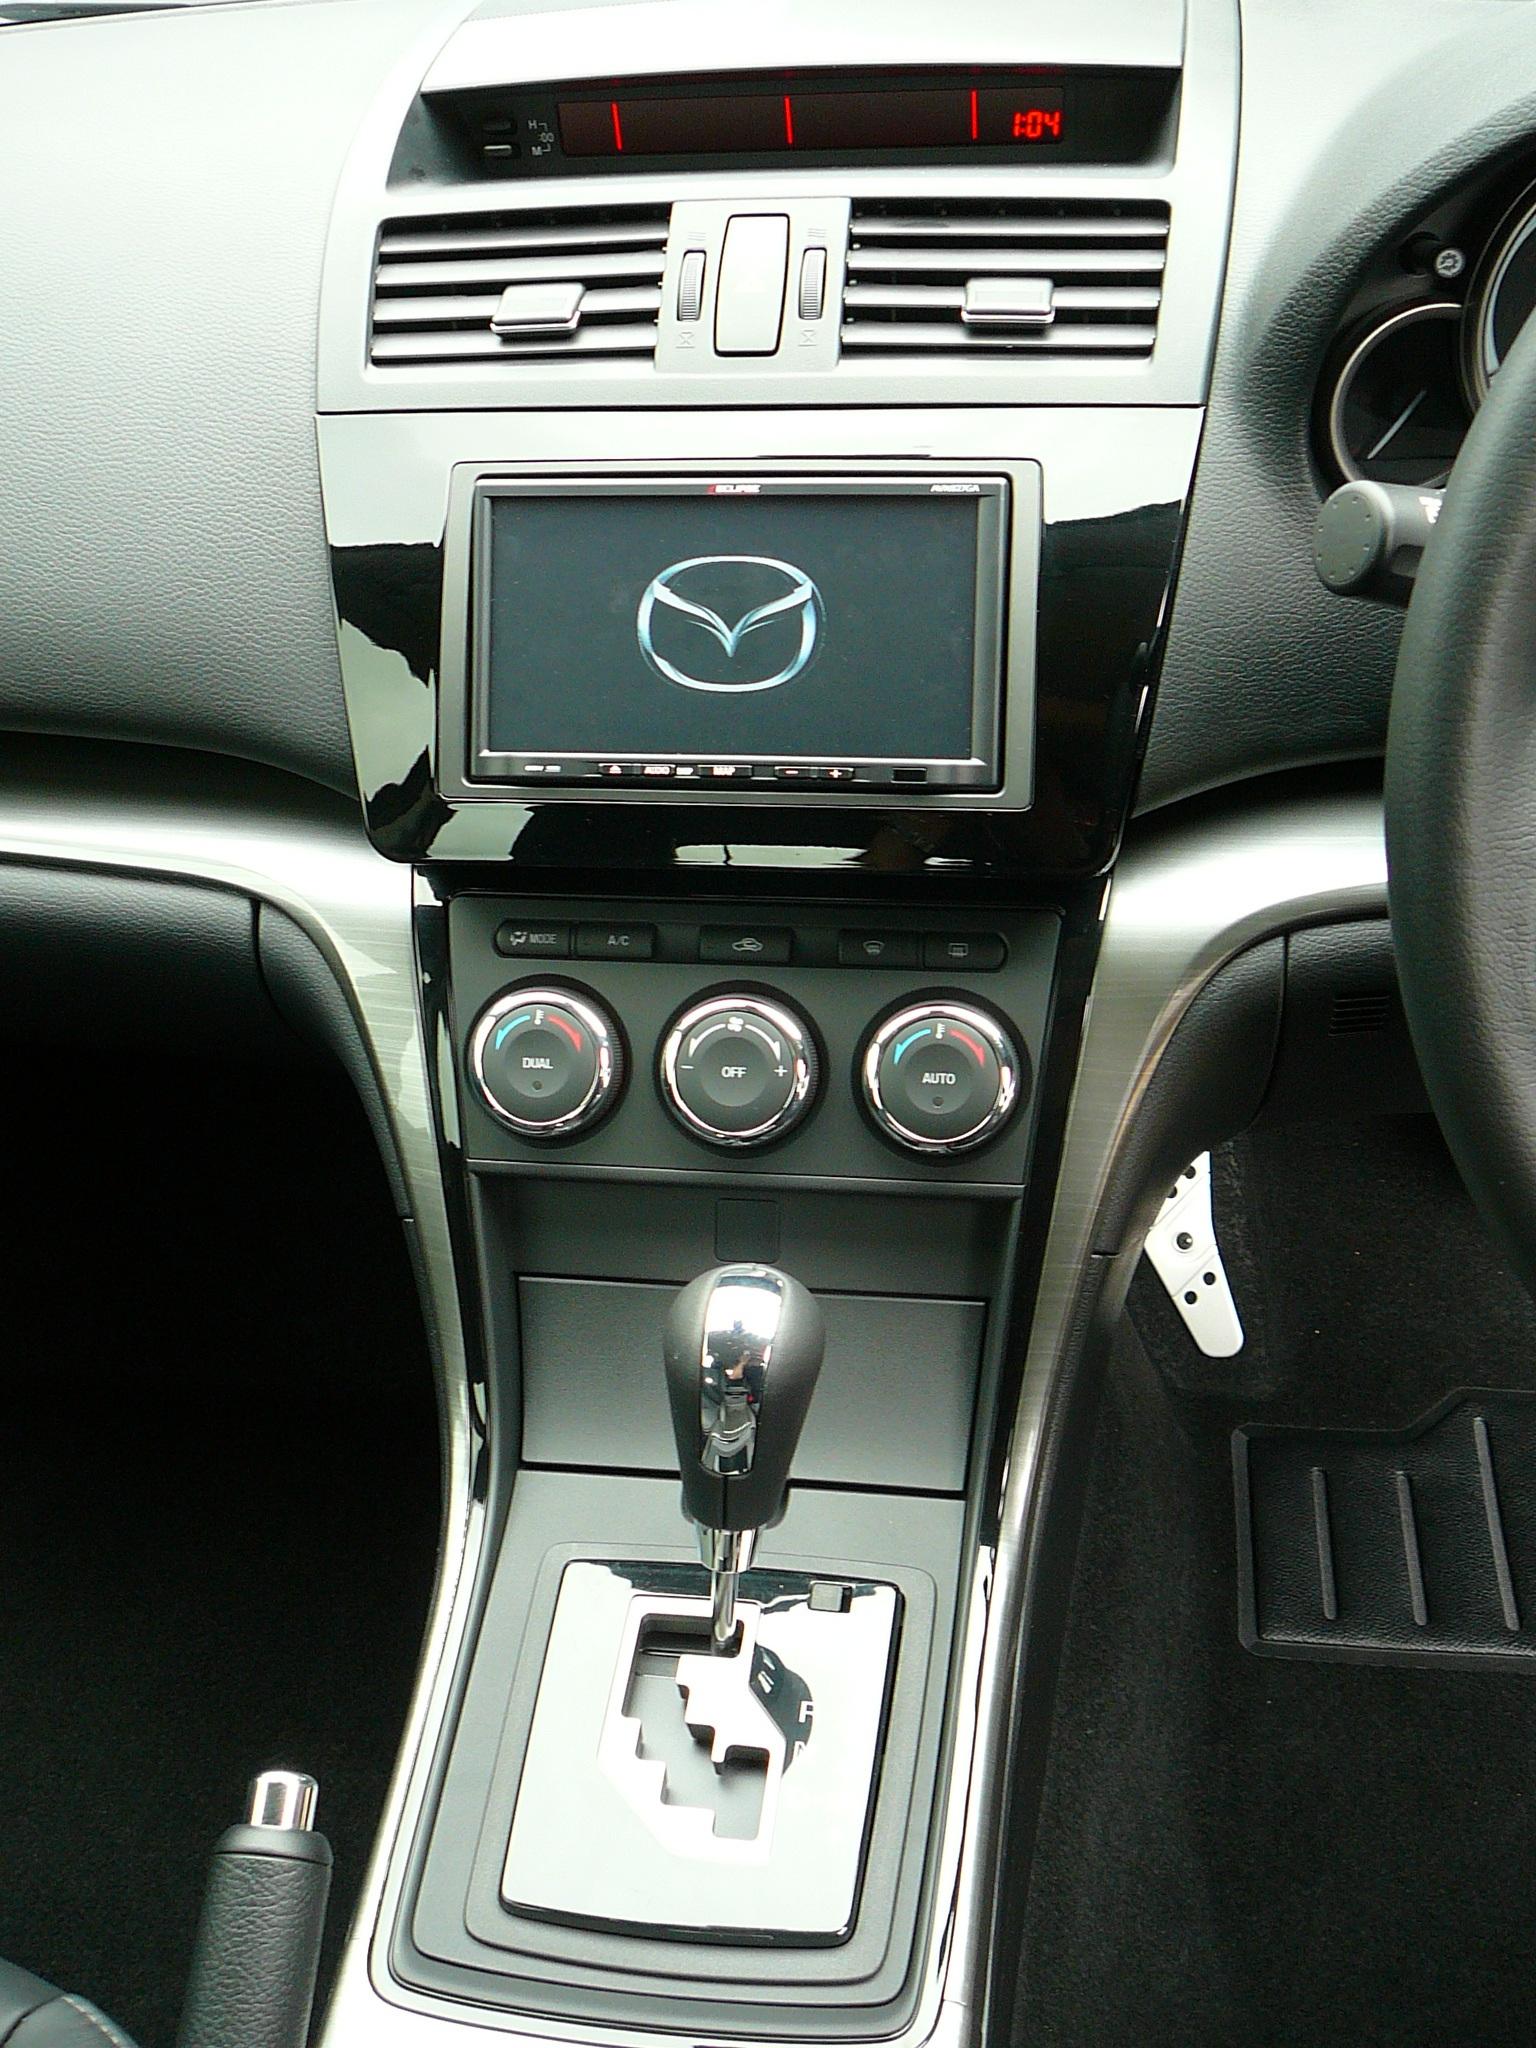 Mazda 6 2011, Eclipse GPS Navigation solution